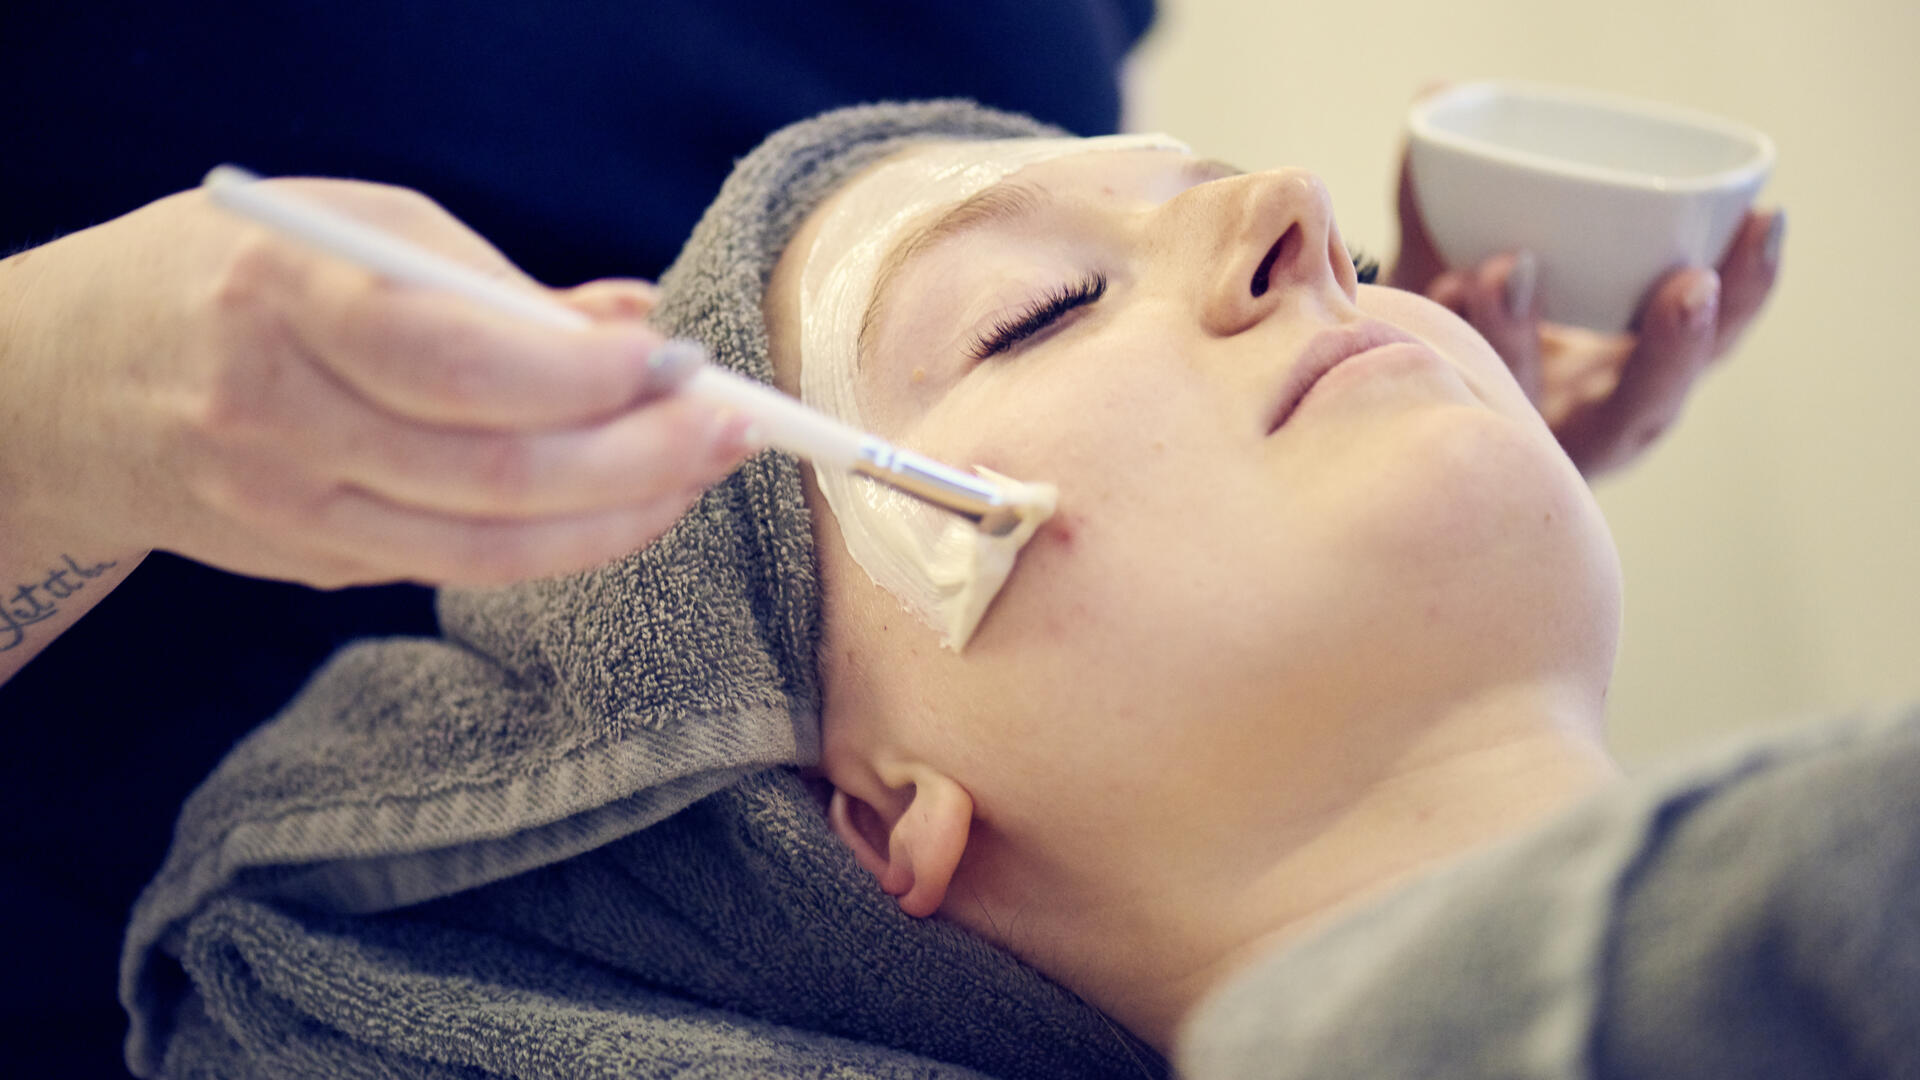 Facial und Gesichtsbehandlung